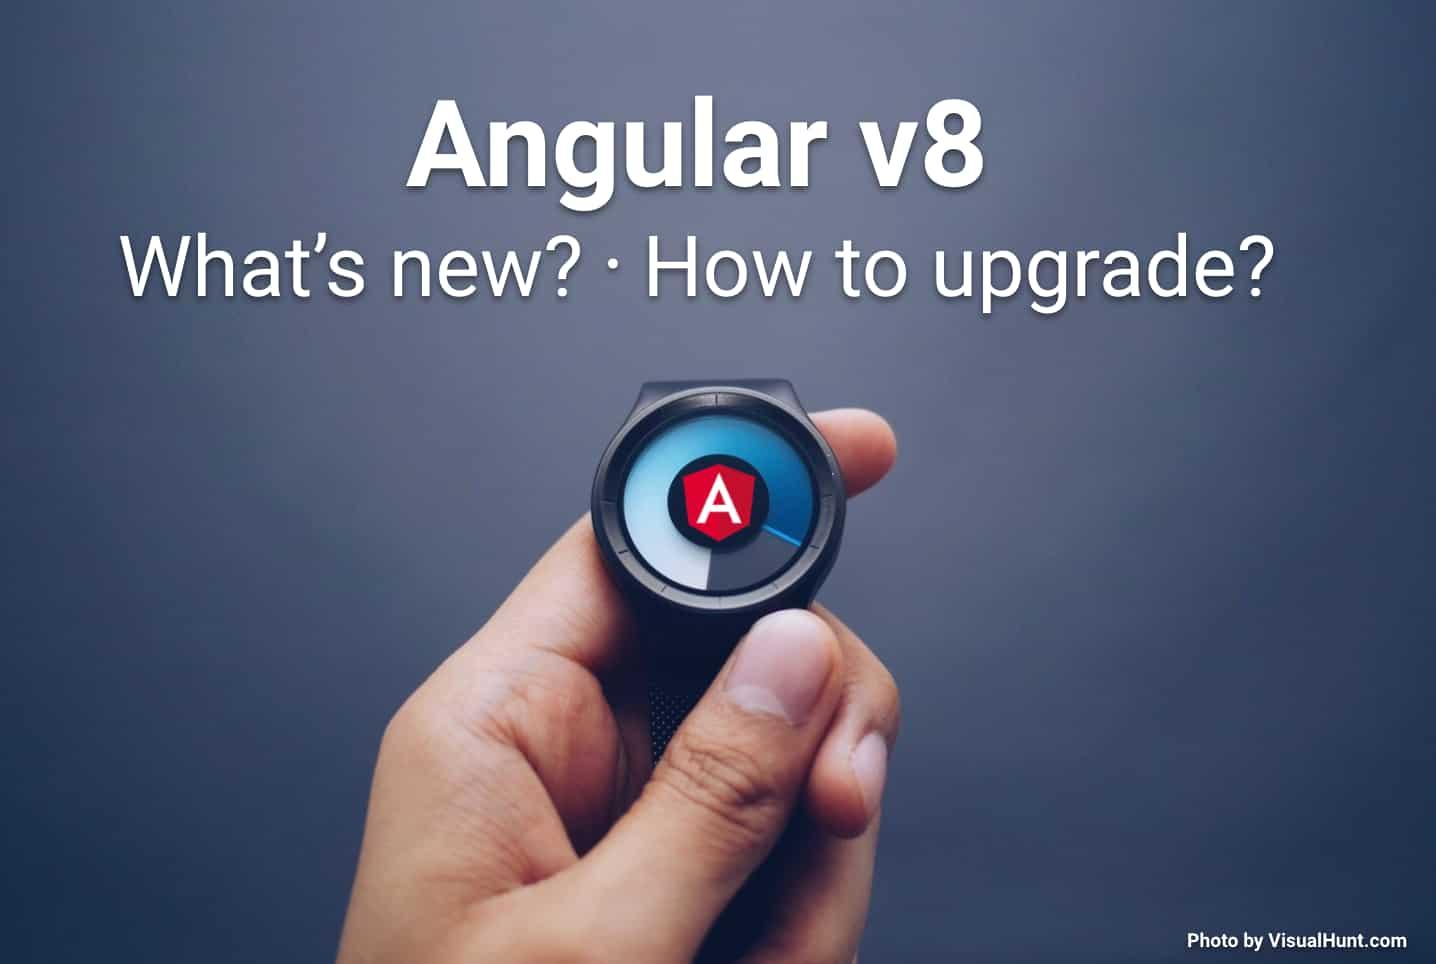 Update to Angular Version 8 now! | juri dev